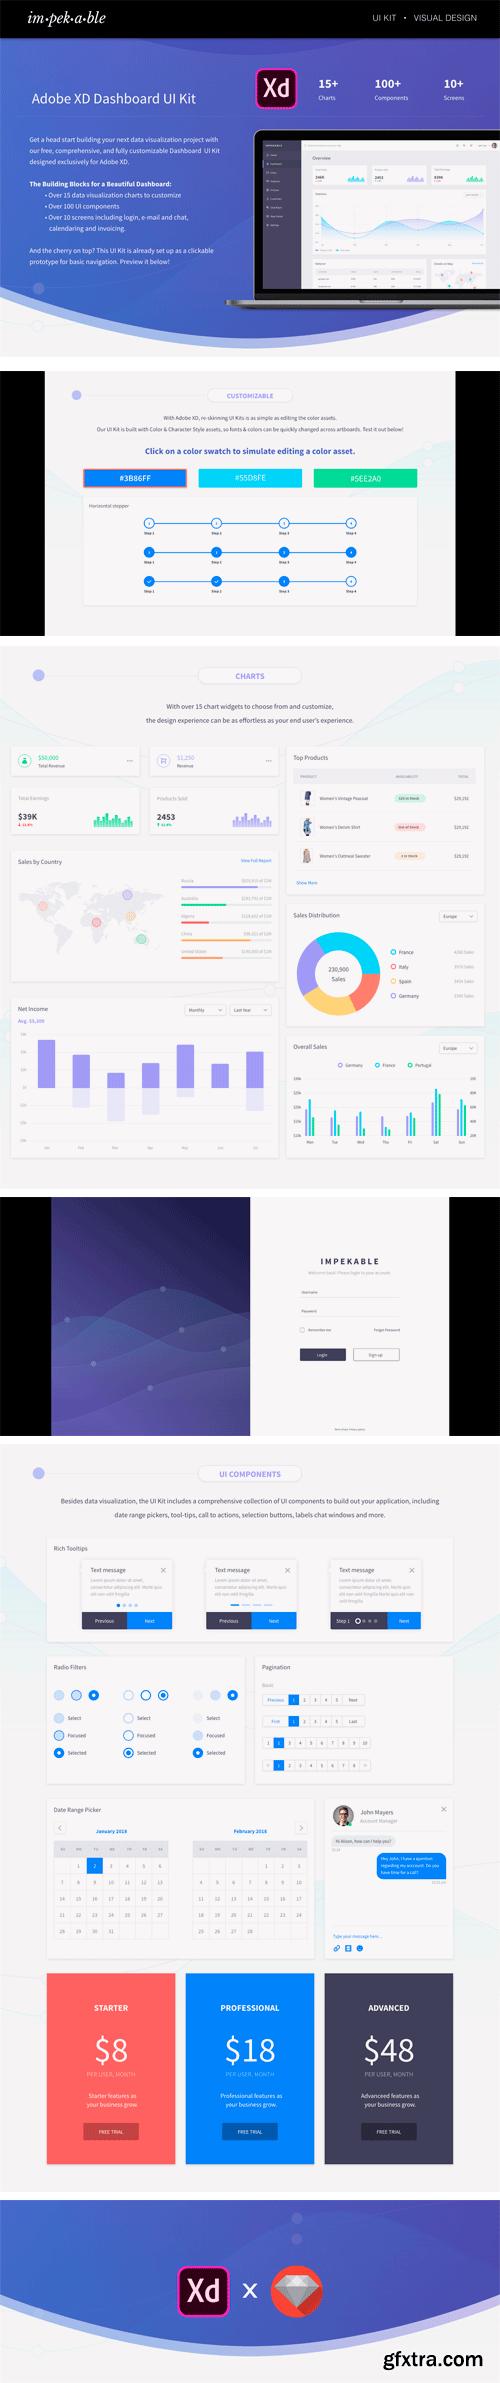 Creativefabrica - Dashboard UI Kit for Adobe XD 447250